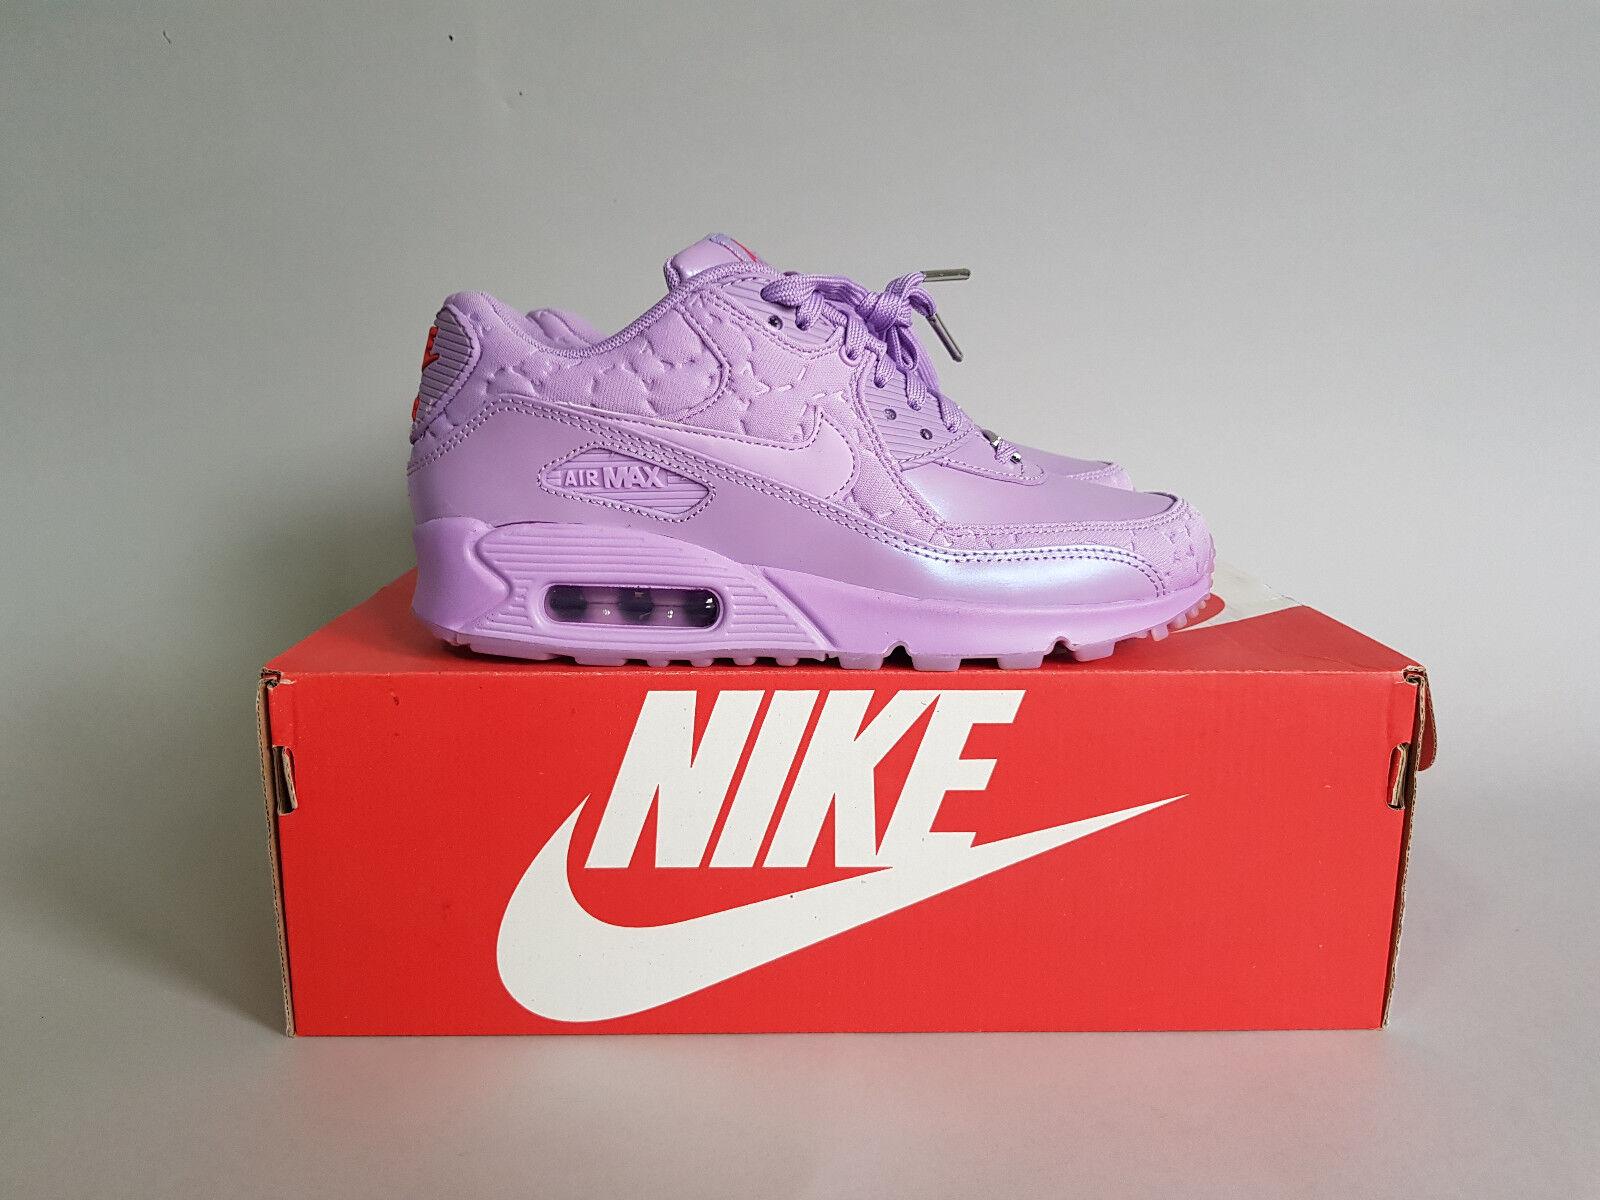 Nike WMNS AIR MAX 90 90 MAX QS Viola/Fuchisa Glow NUOVO CON SCATOLA UK4/US6.5/EU37.5 813150-500 6ef148